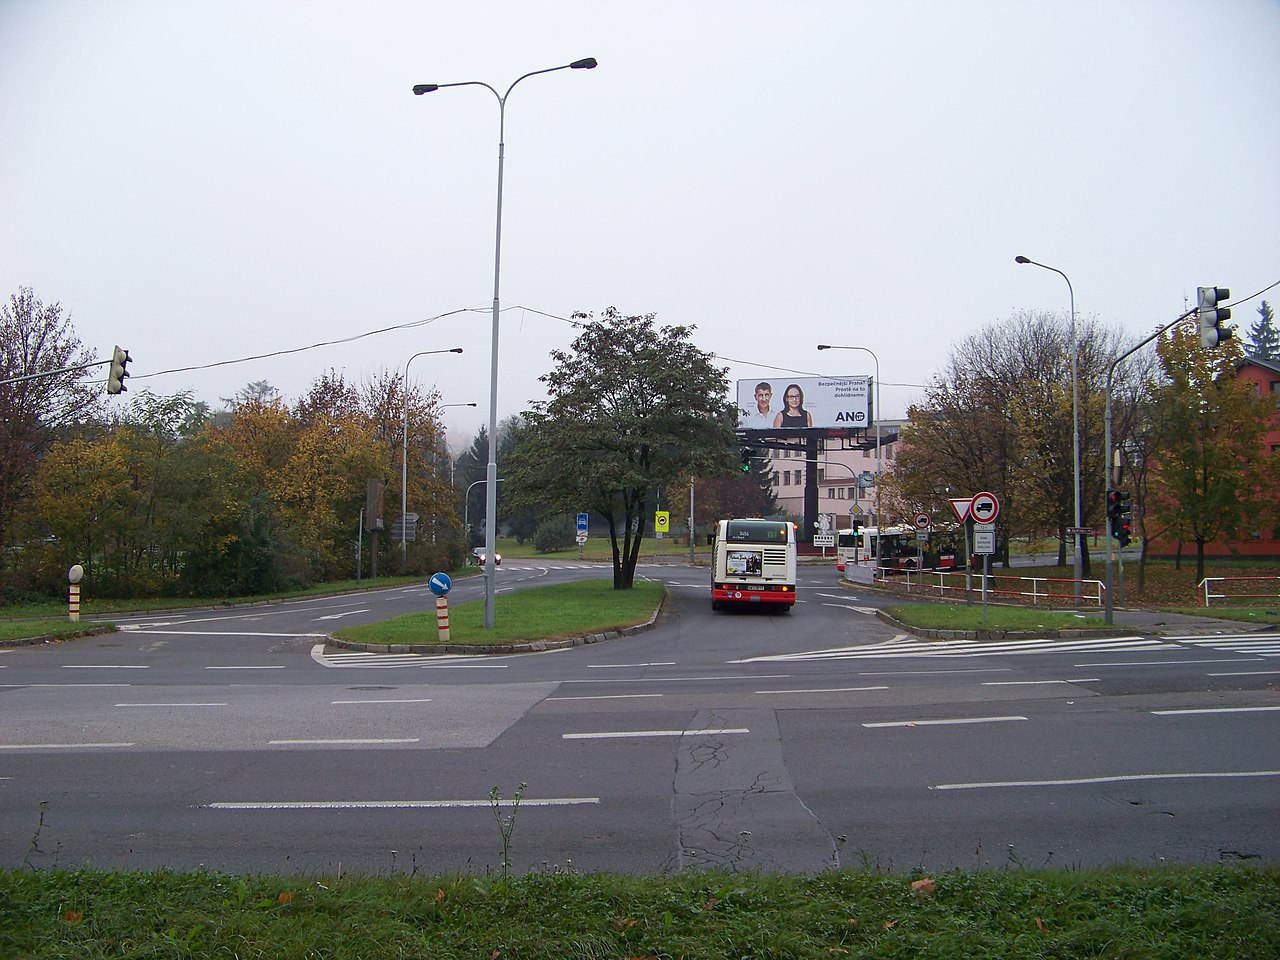 Michelská ulice v Praze. Autor: ŠJů, Wikimedia Commons, CC BY 4.0, https://commons.wikimedia.org/w/index.php?curid=36573706